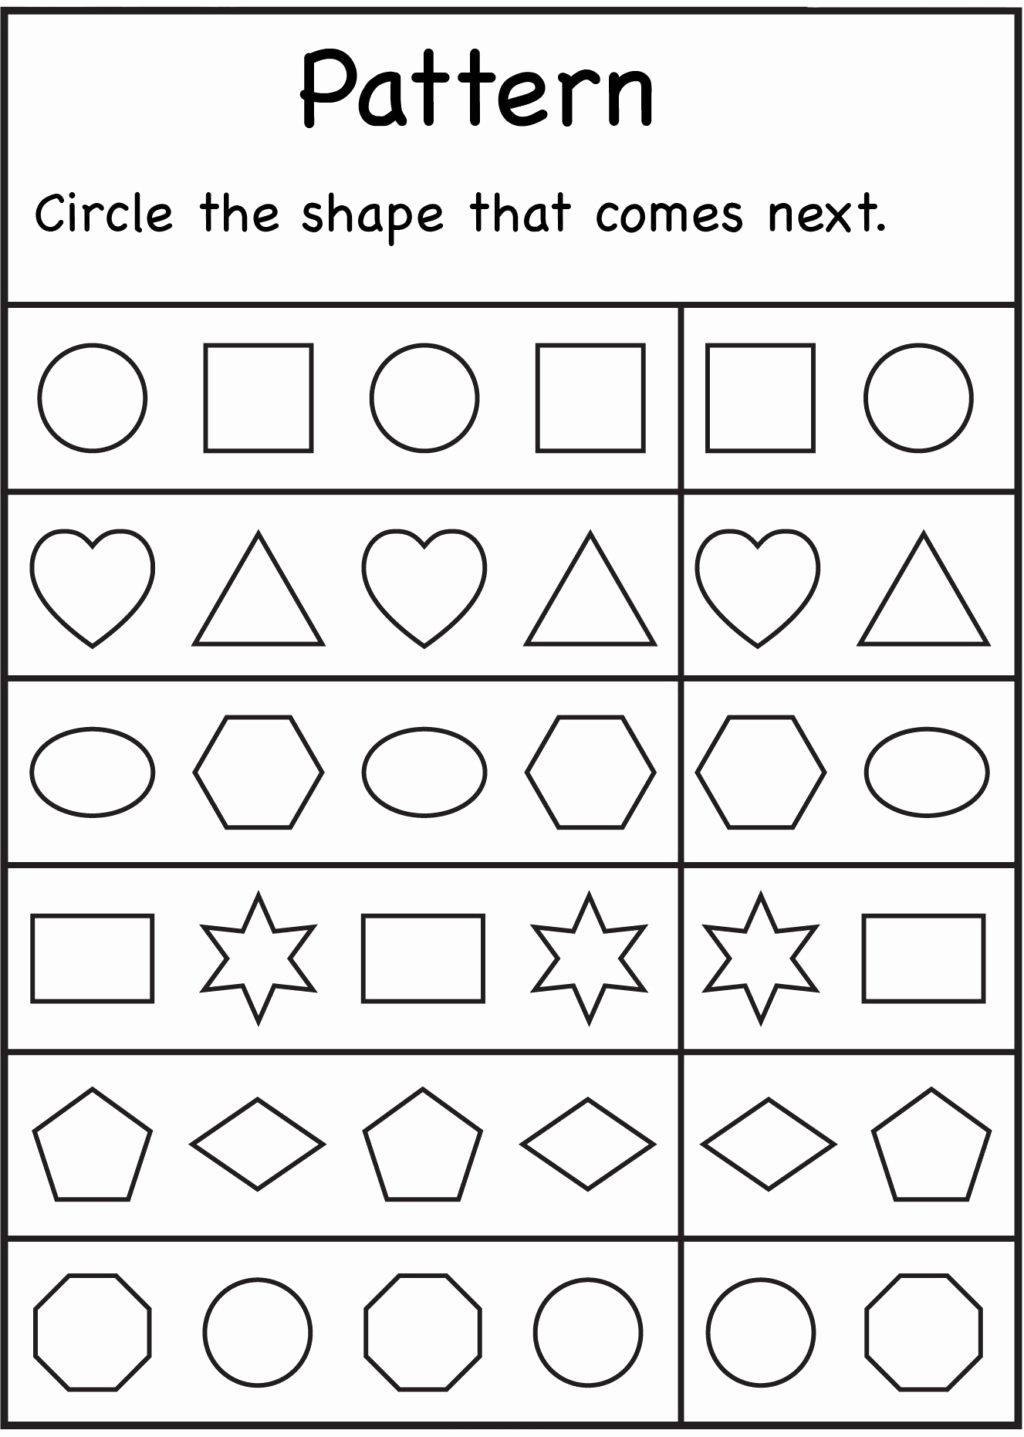 Worksheets For Preschoolers Math